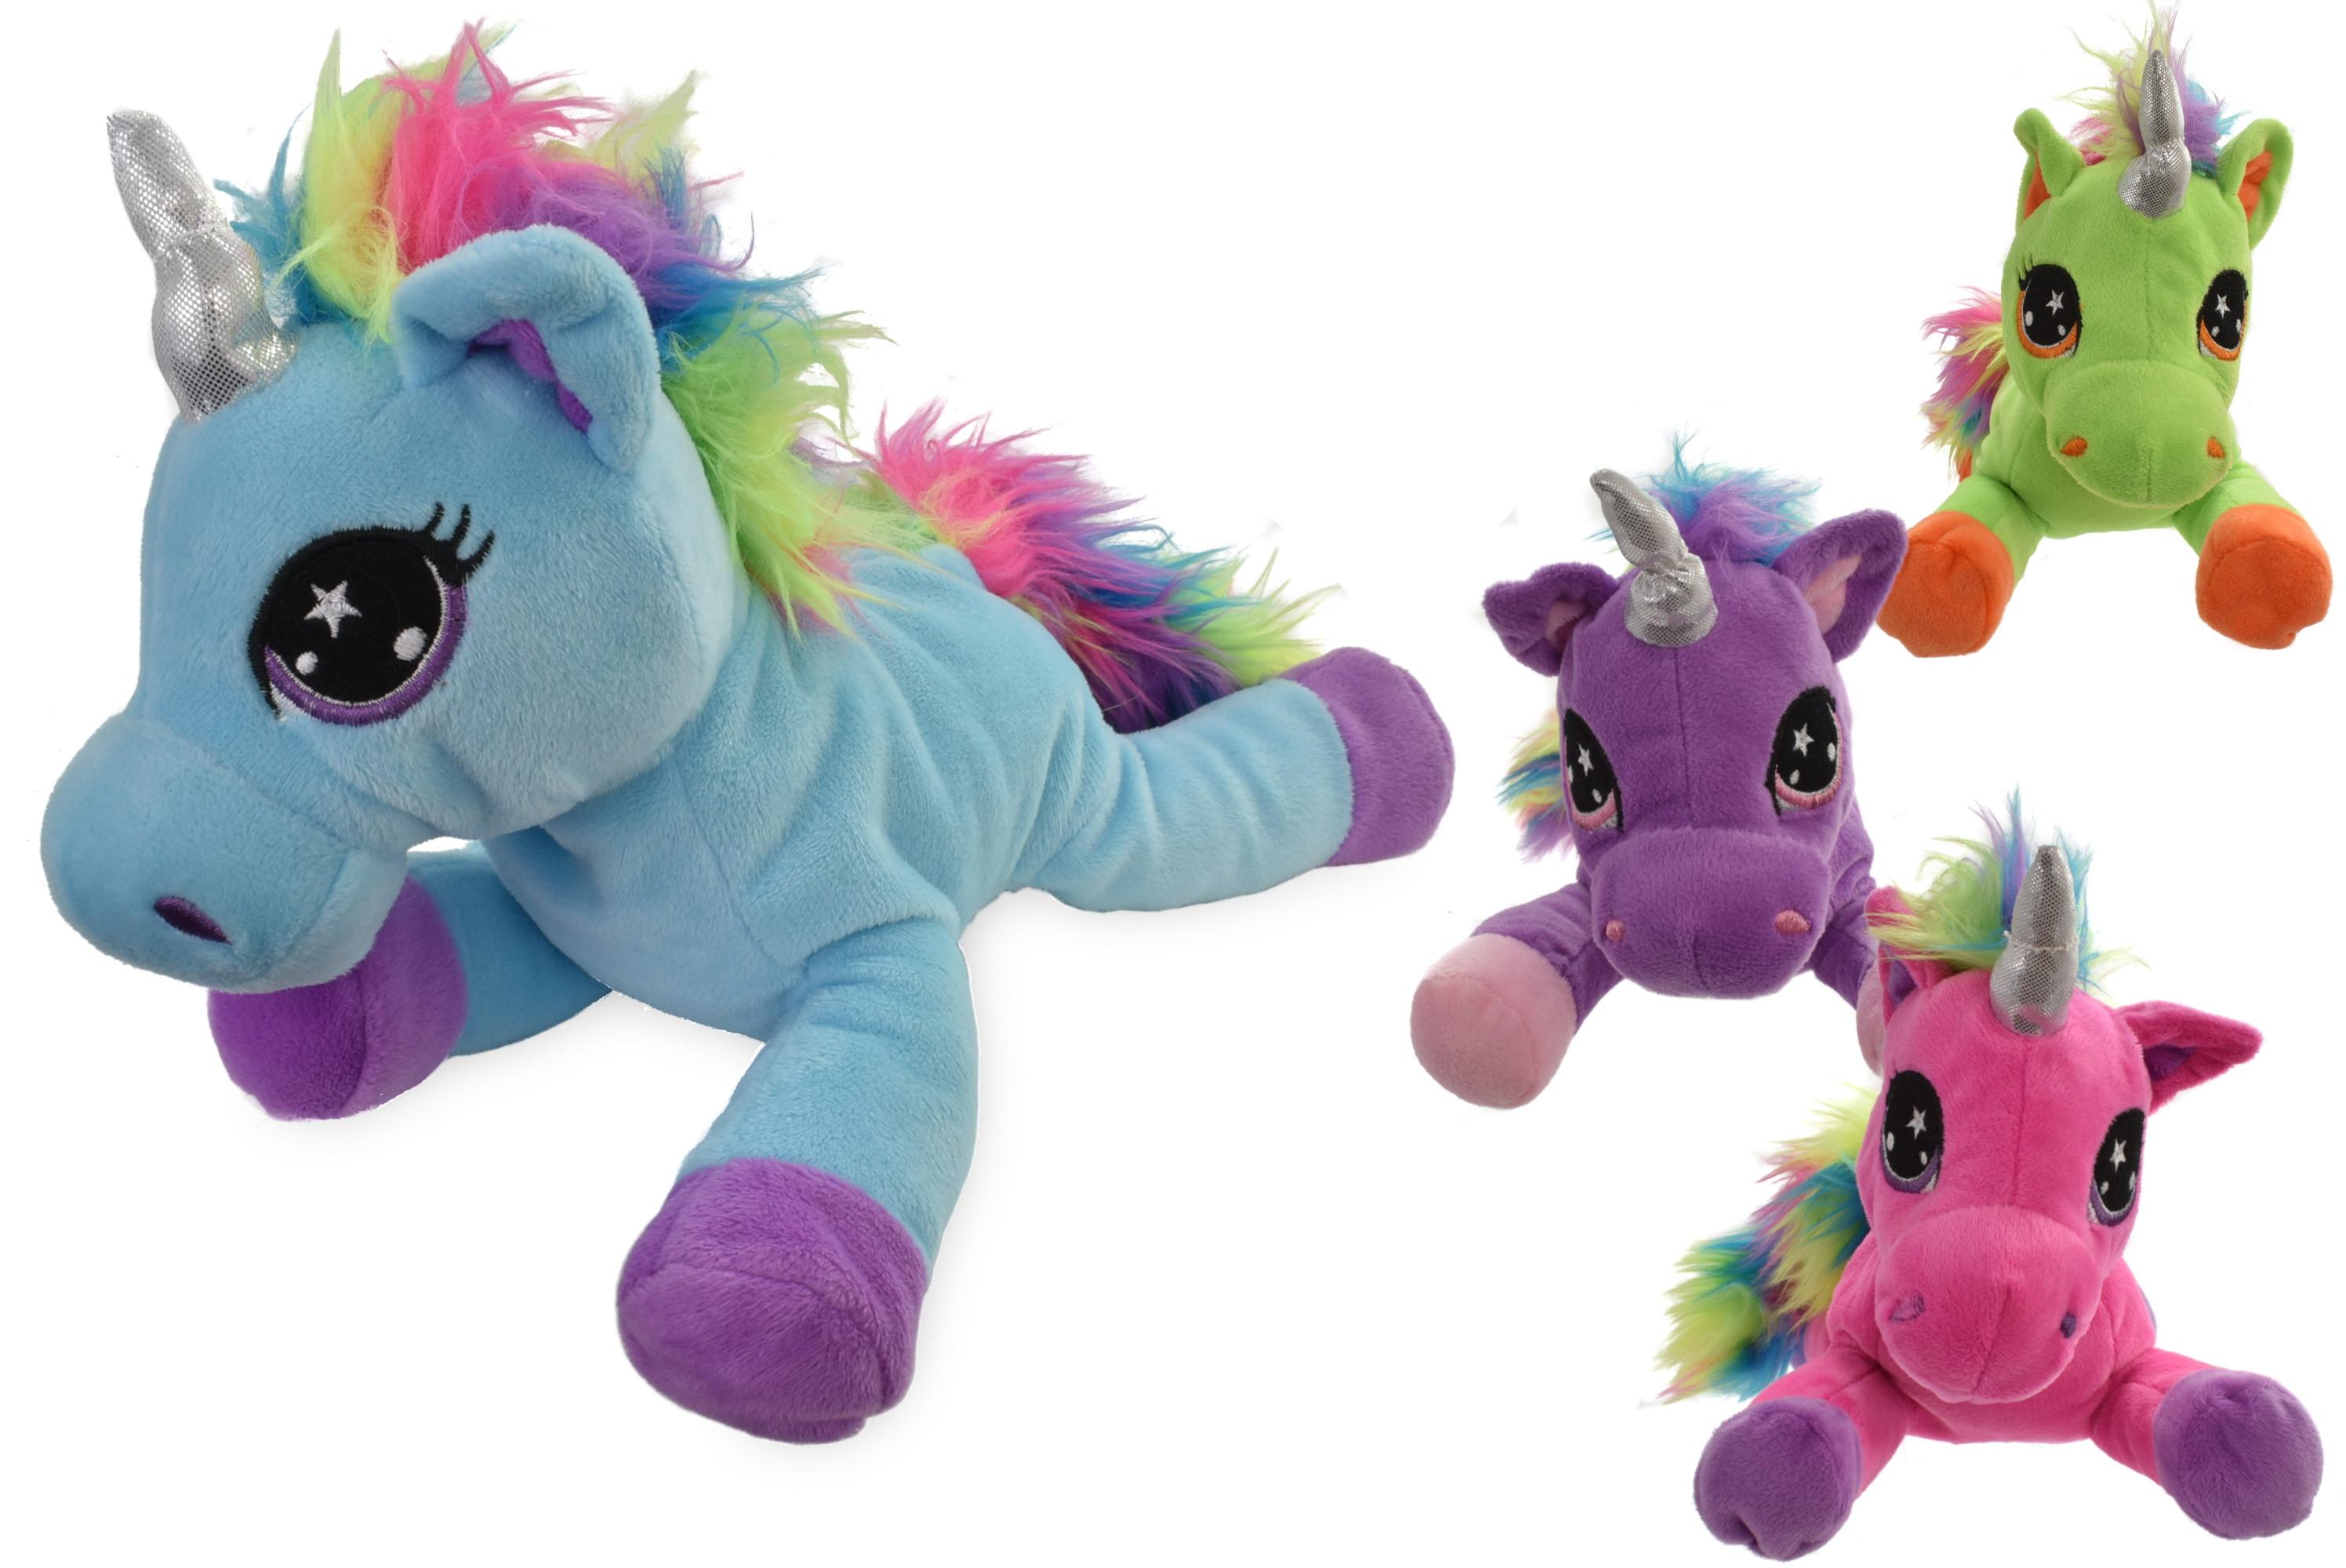 Plush Rainbow Unicorn - 4 Assorted Colours